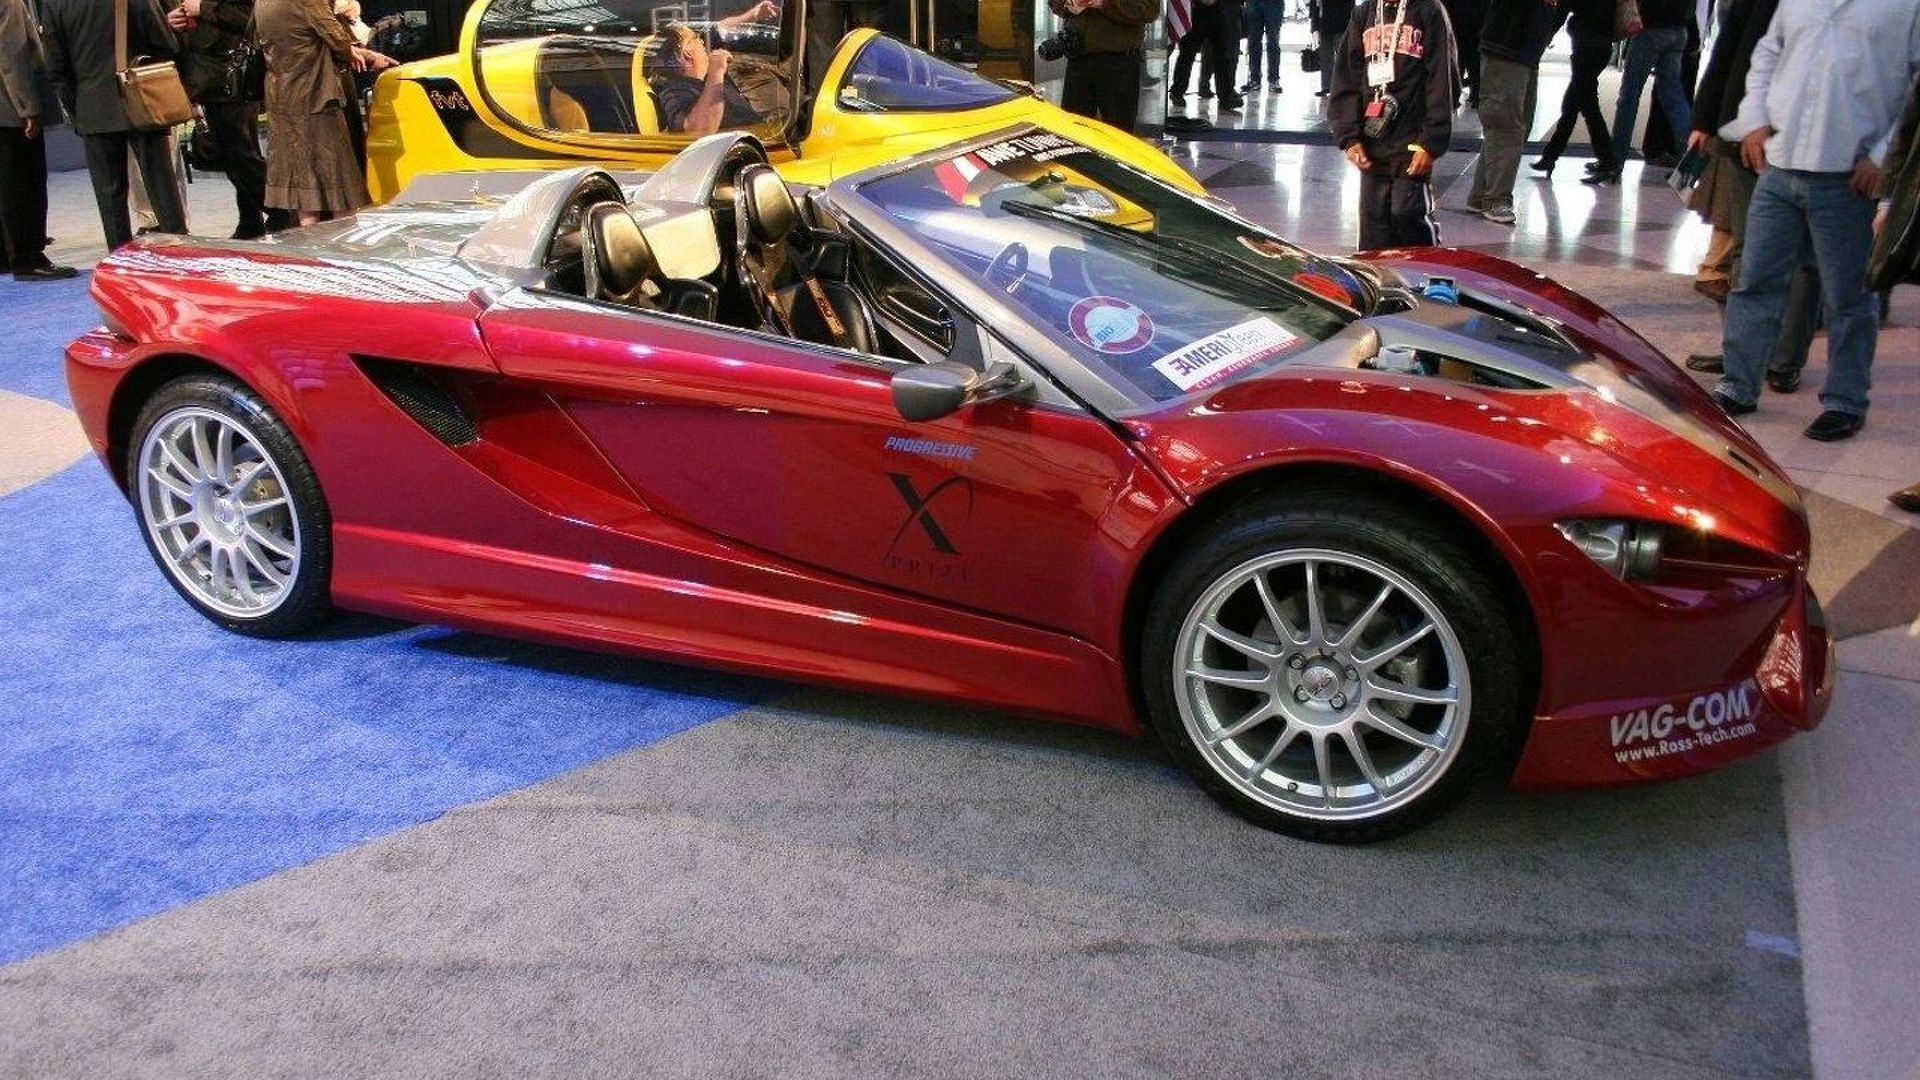 X PRIZE Foundation Announces $10M Prize for 100 MPGe Vehicle